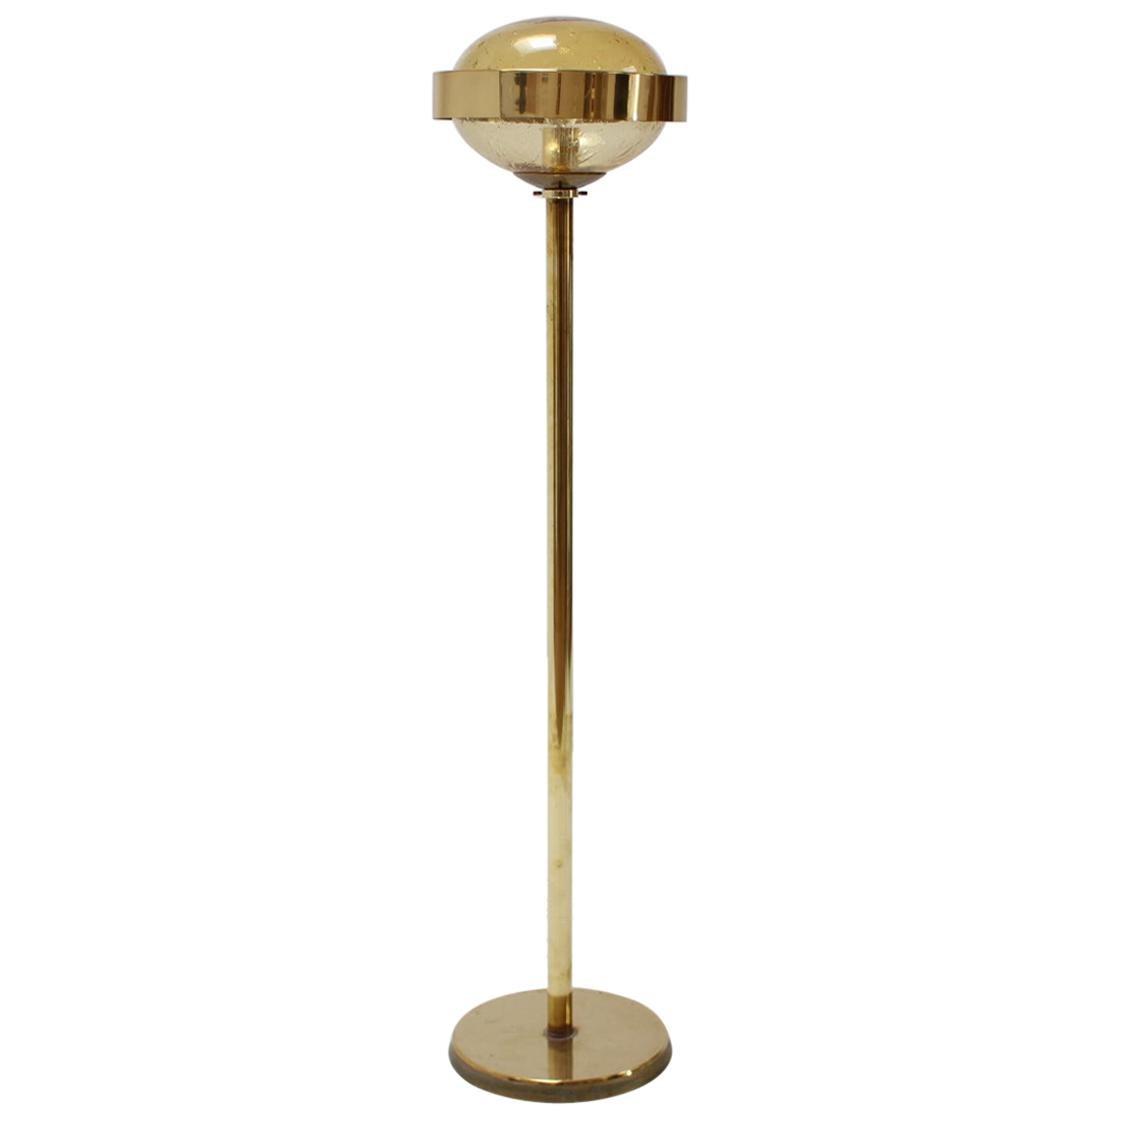 1970s Preciosa Gold Floor Lamp, Czechoslovakia